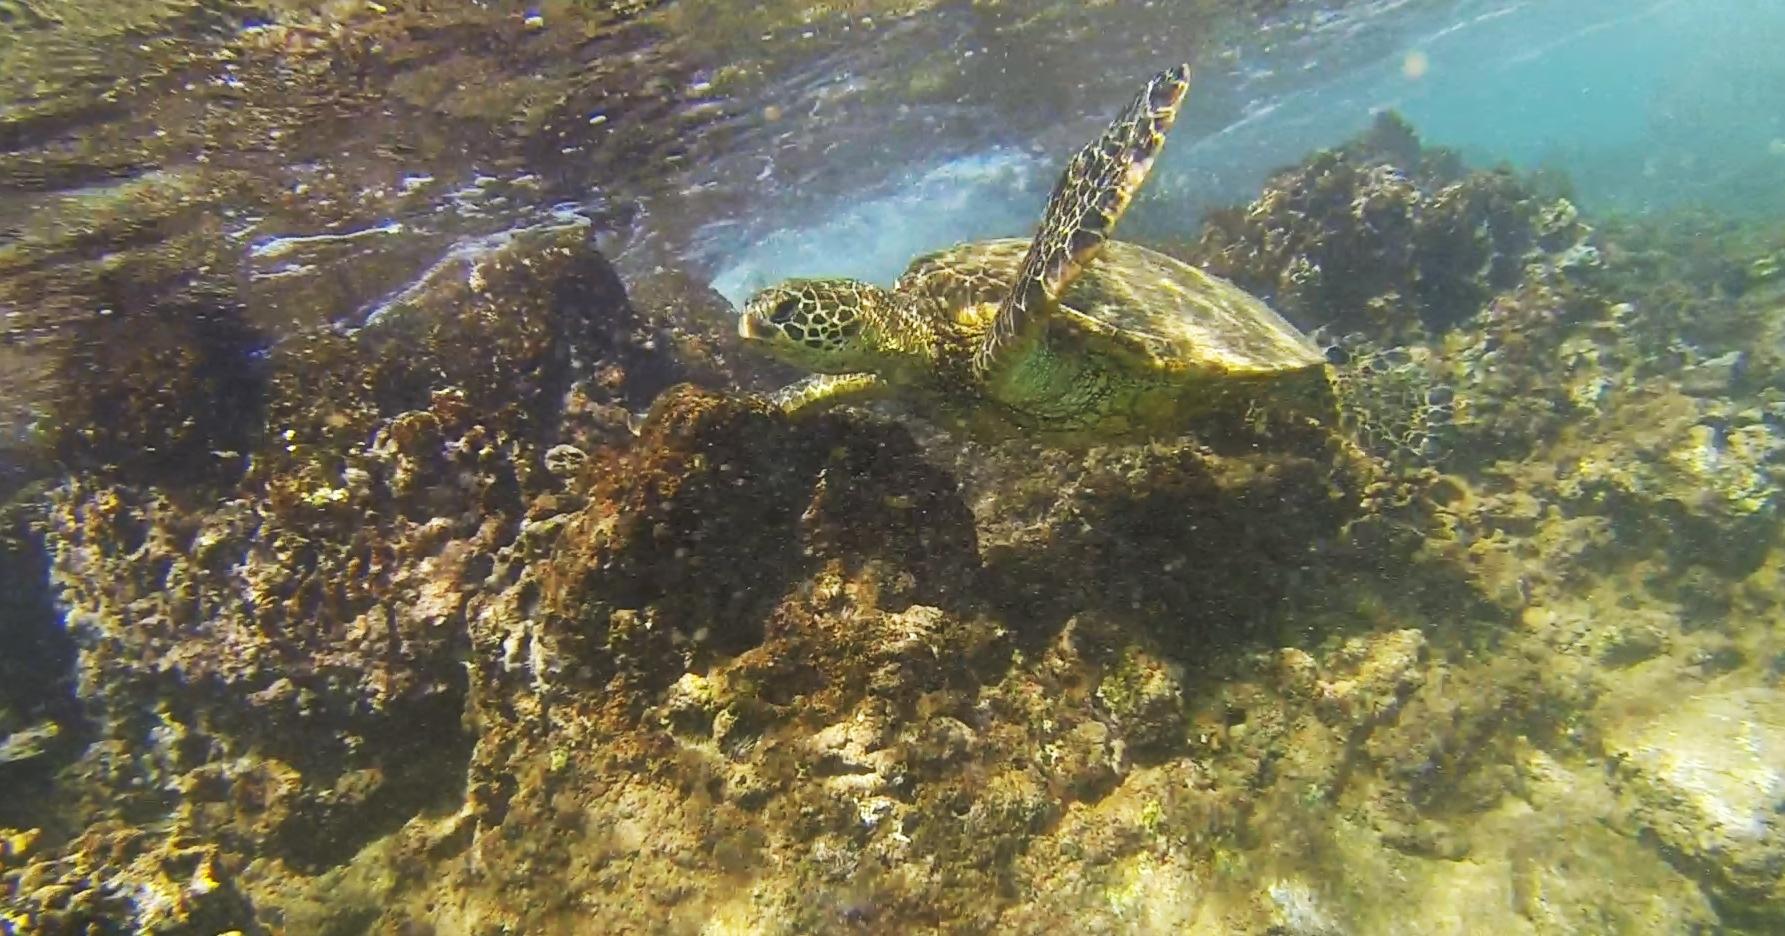 Name:  Turtle2 (2).jpg Views: 275 Size:  846.7 KB